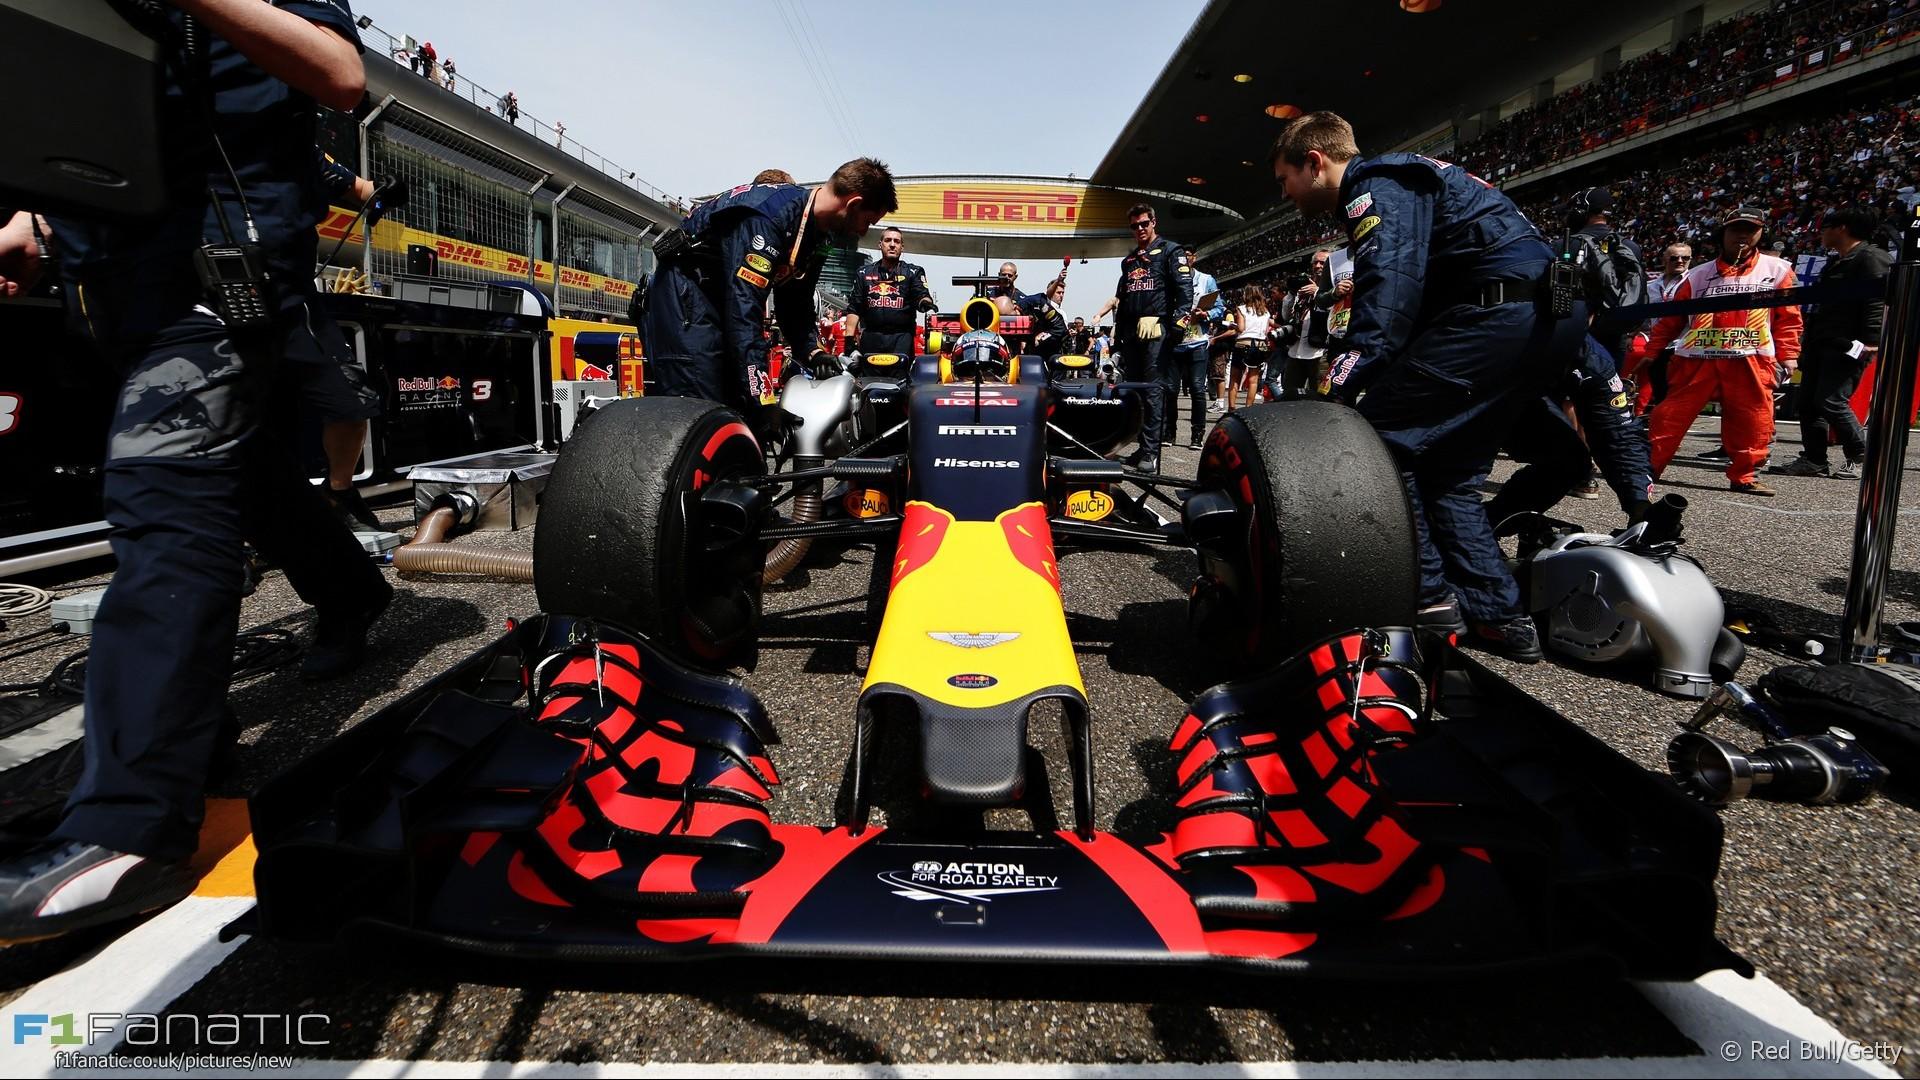 Daniel Ricciardo, Red Bull, Shanghai International Circuit, 2016